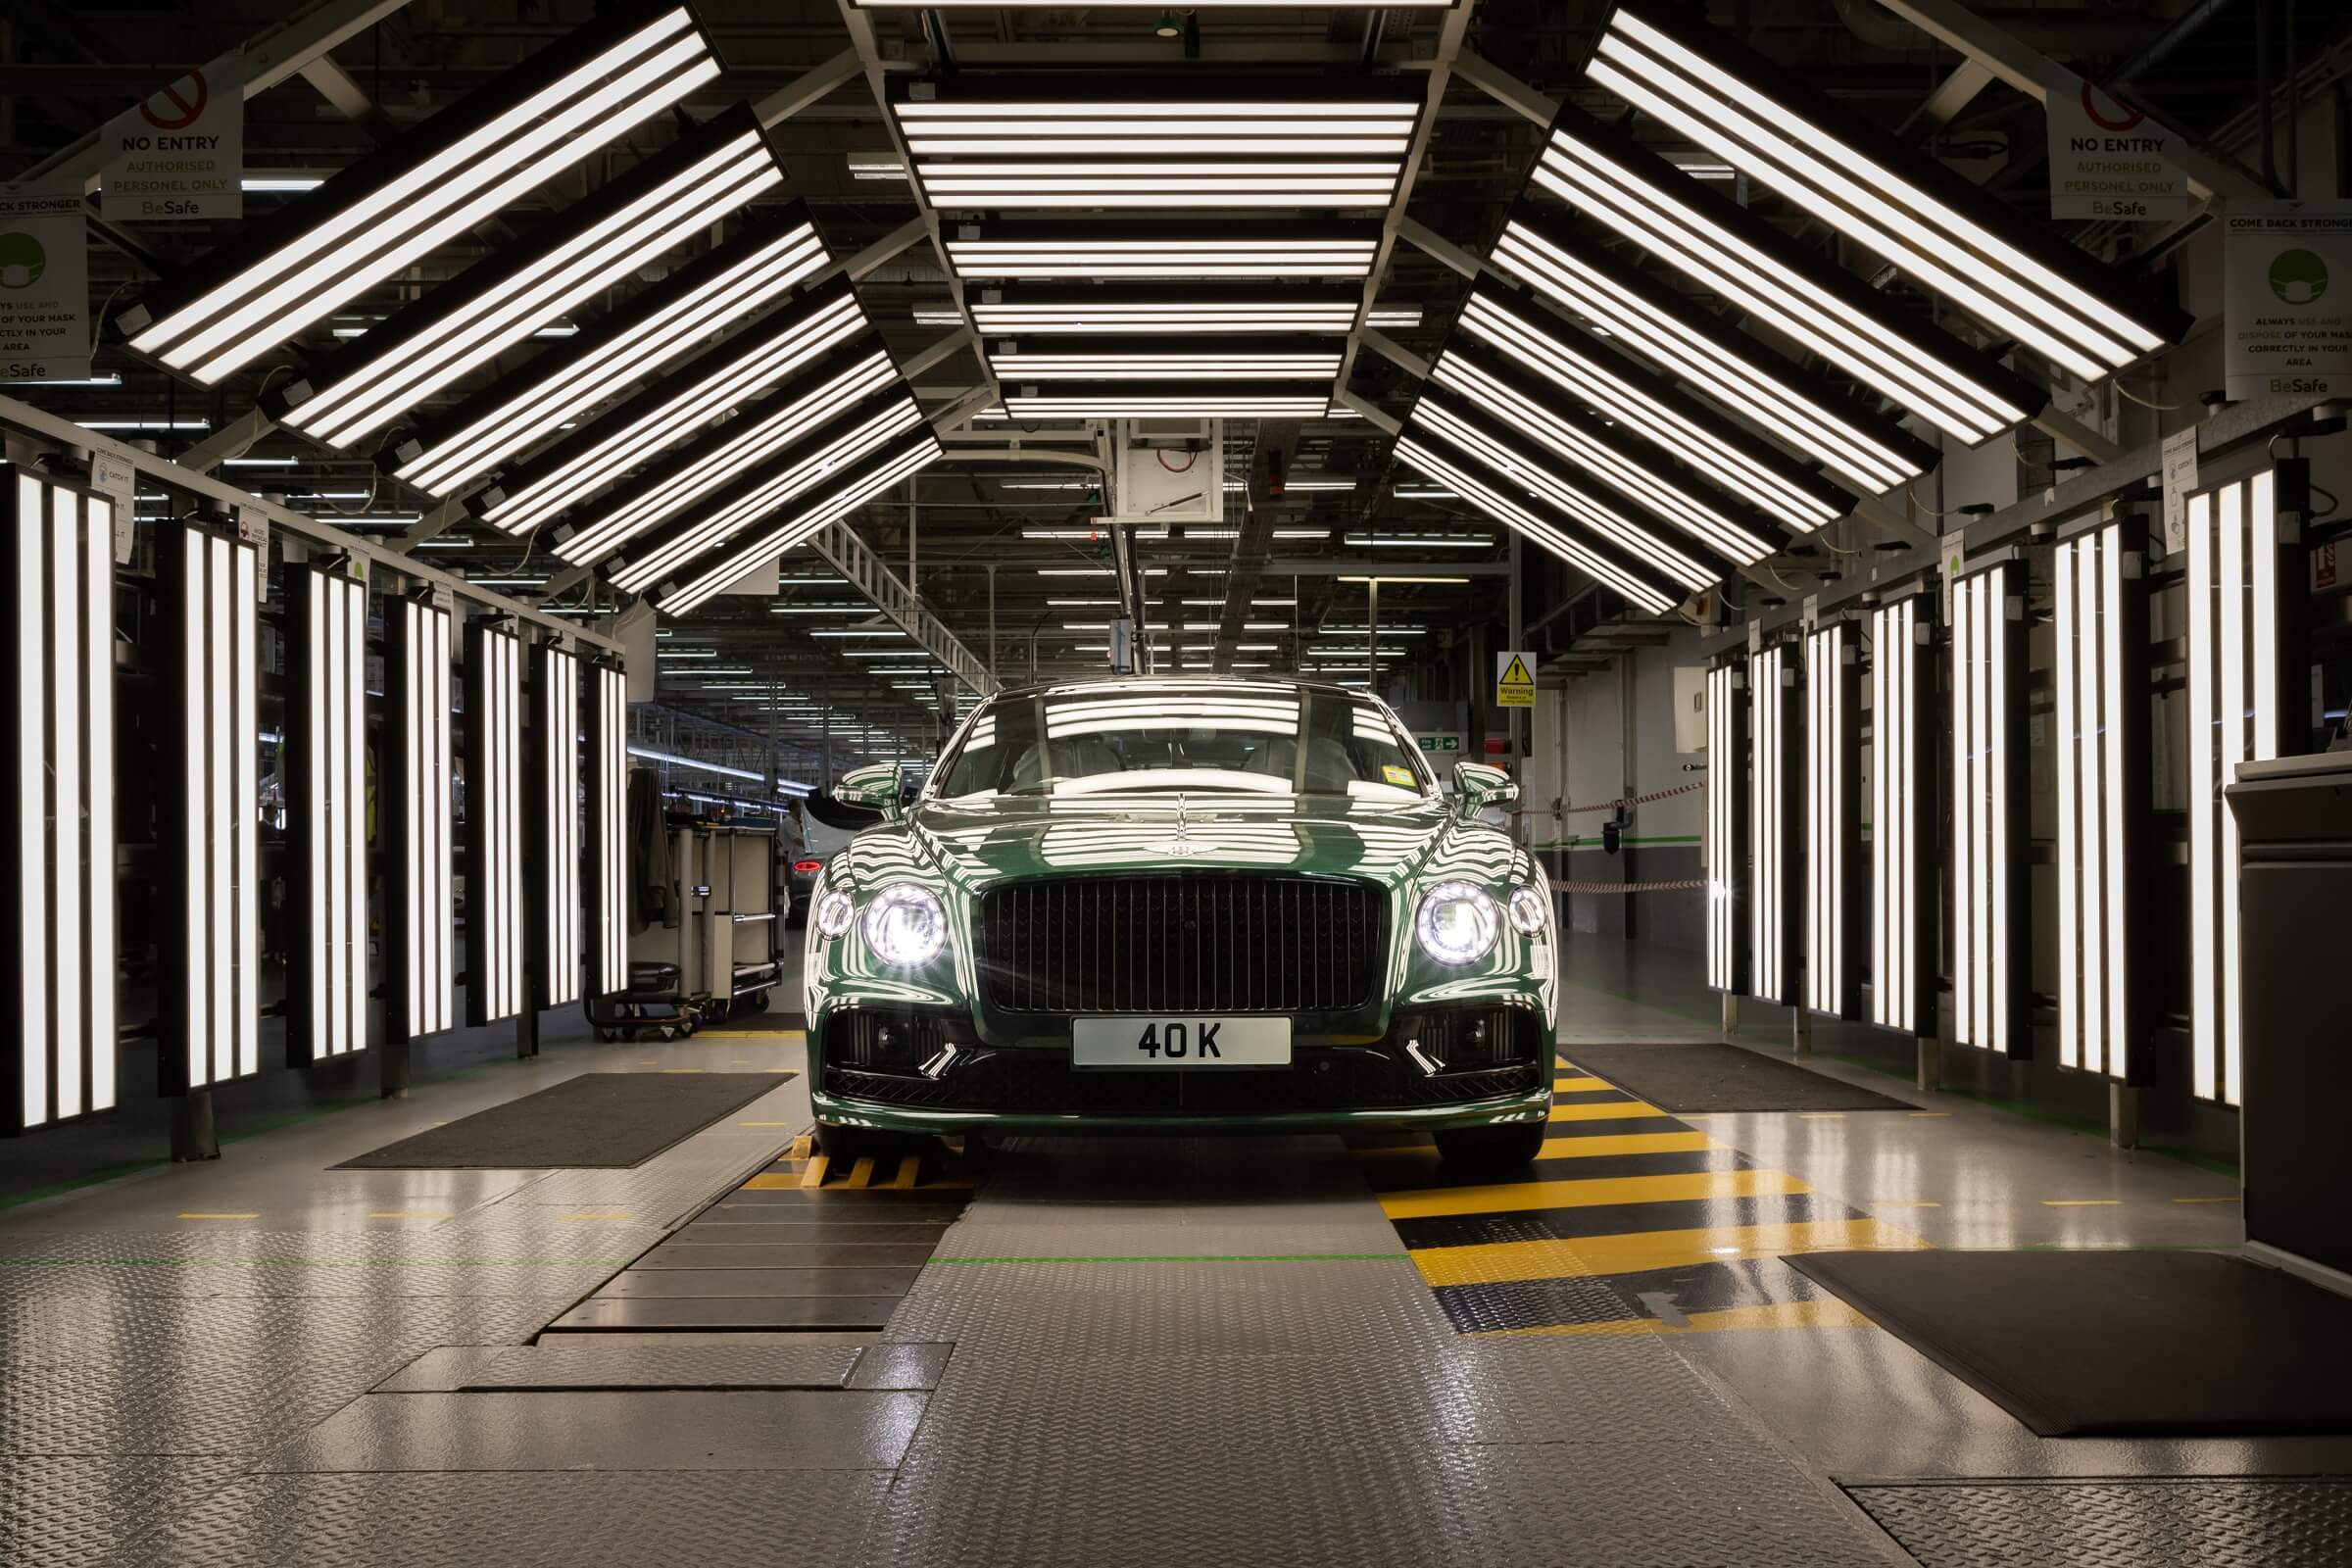 Bentley Flying Spur - Έσπασε το φράγμα των 40.000 αυτοκινήτων